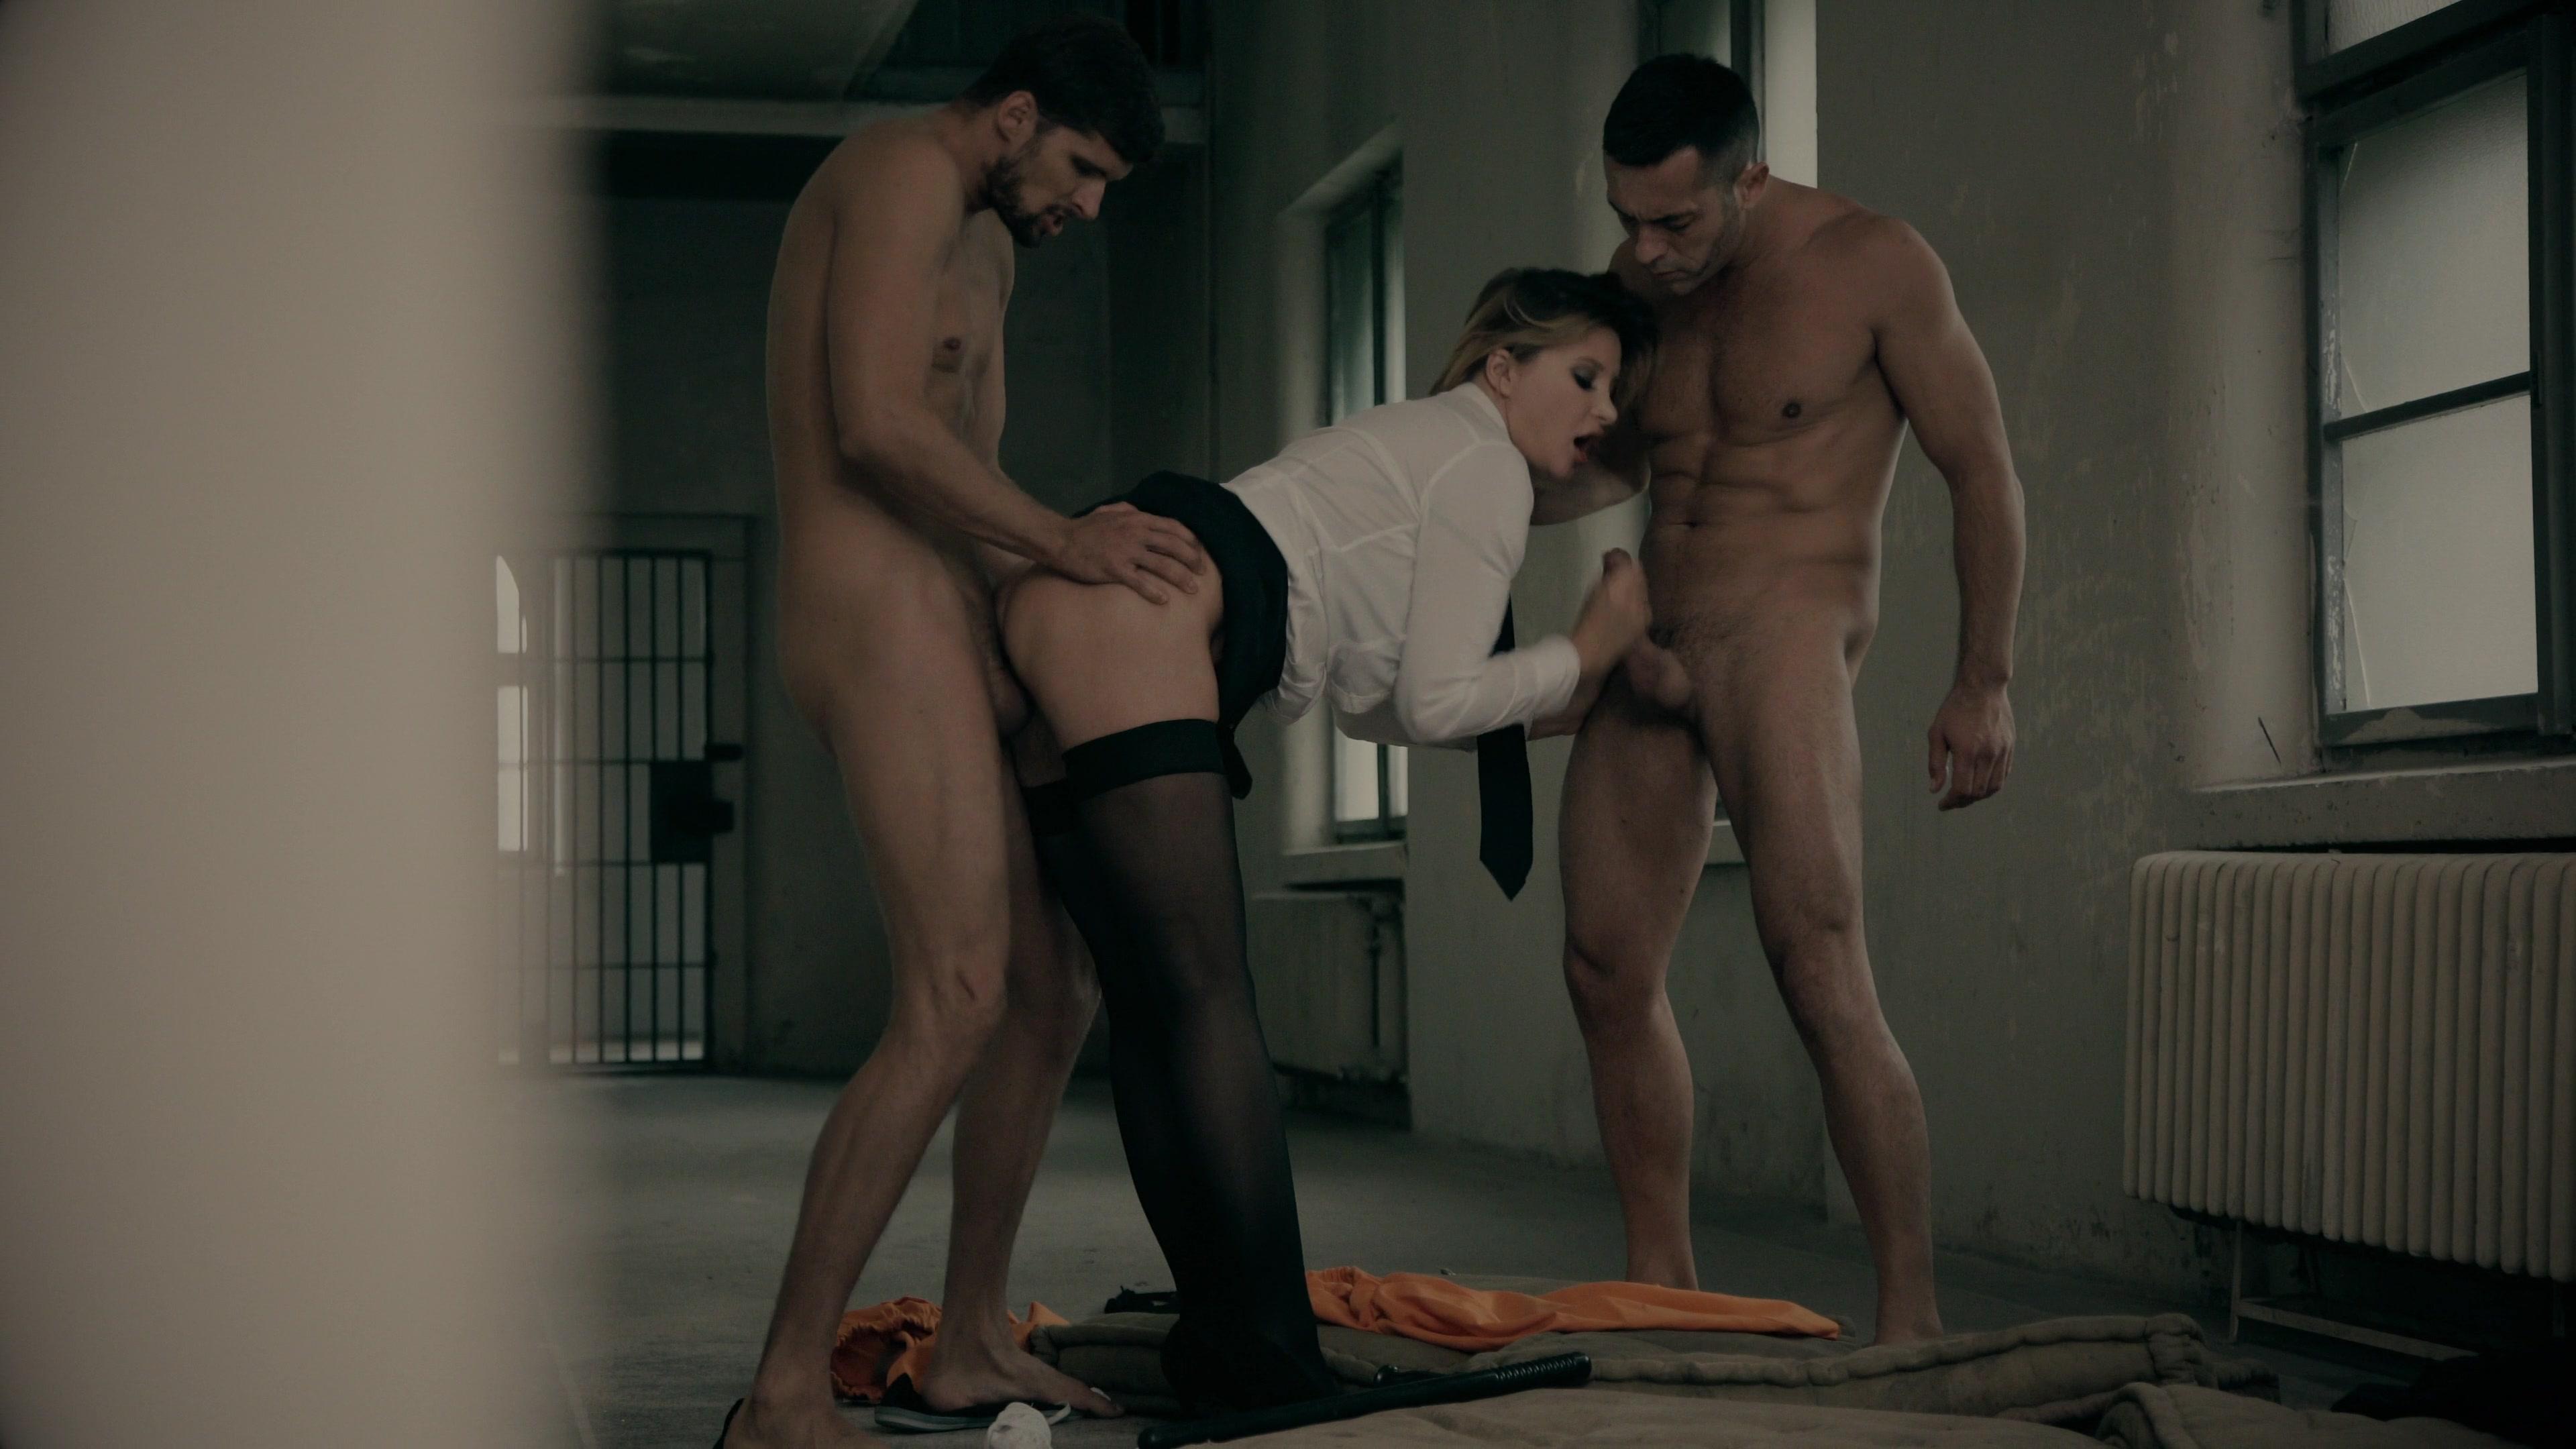 starie-porno-filmi-v-tyurme-foto-hudenkih-smuglih-devushek